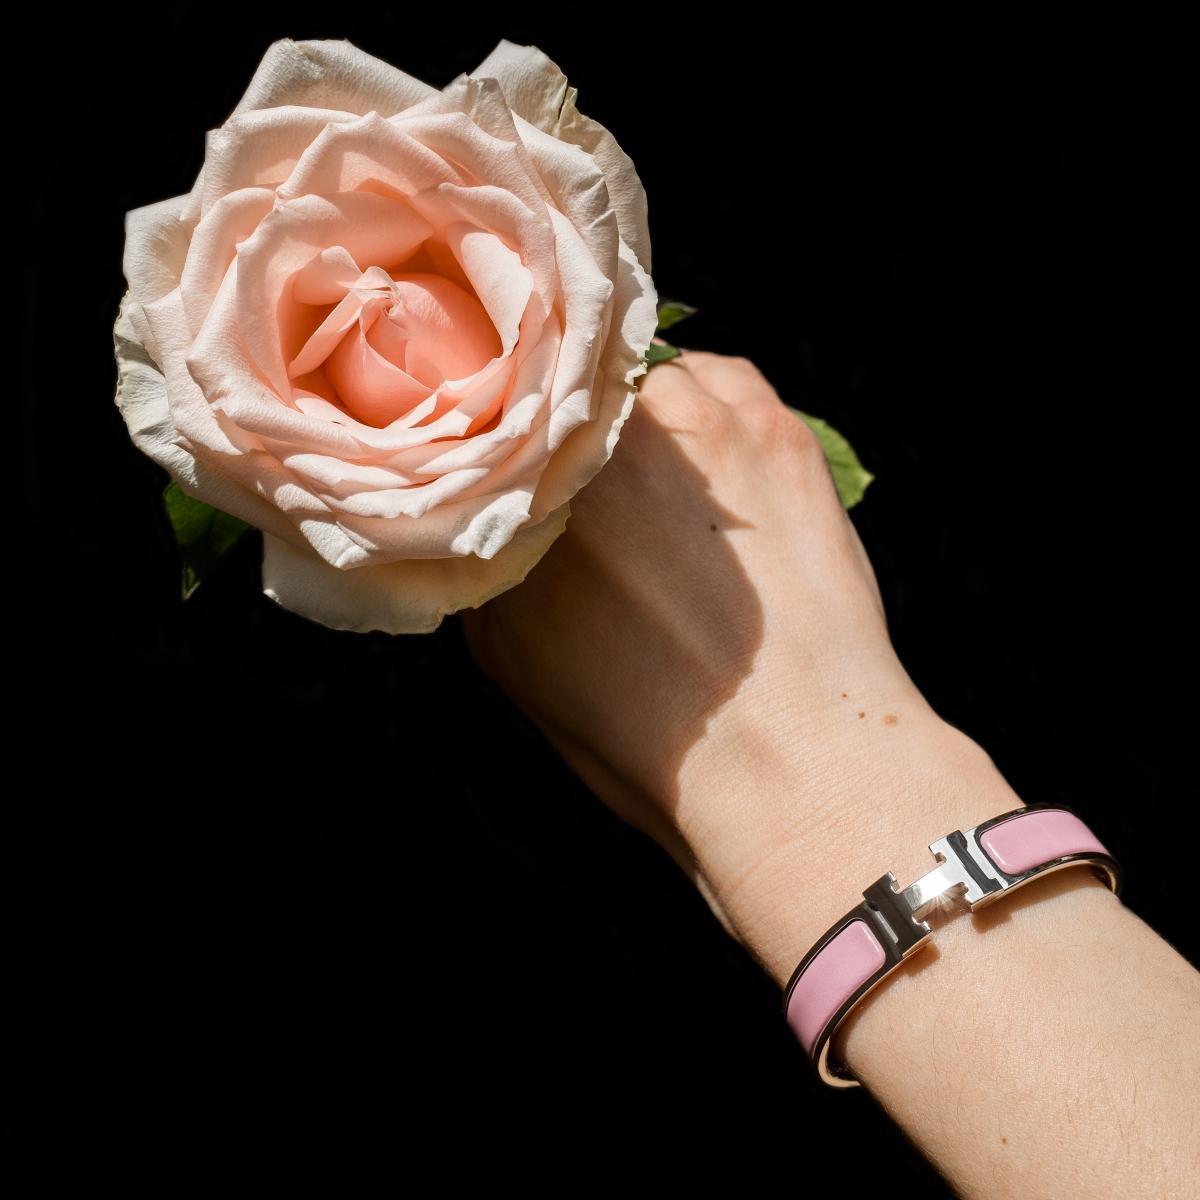 Hermes Clic H, Hermes enamel bracelet, Hermes jewelry, Hermes Clic Clac, rose nacarat